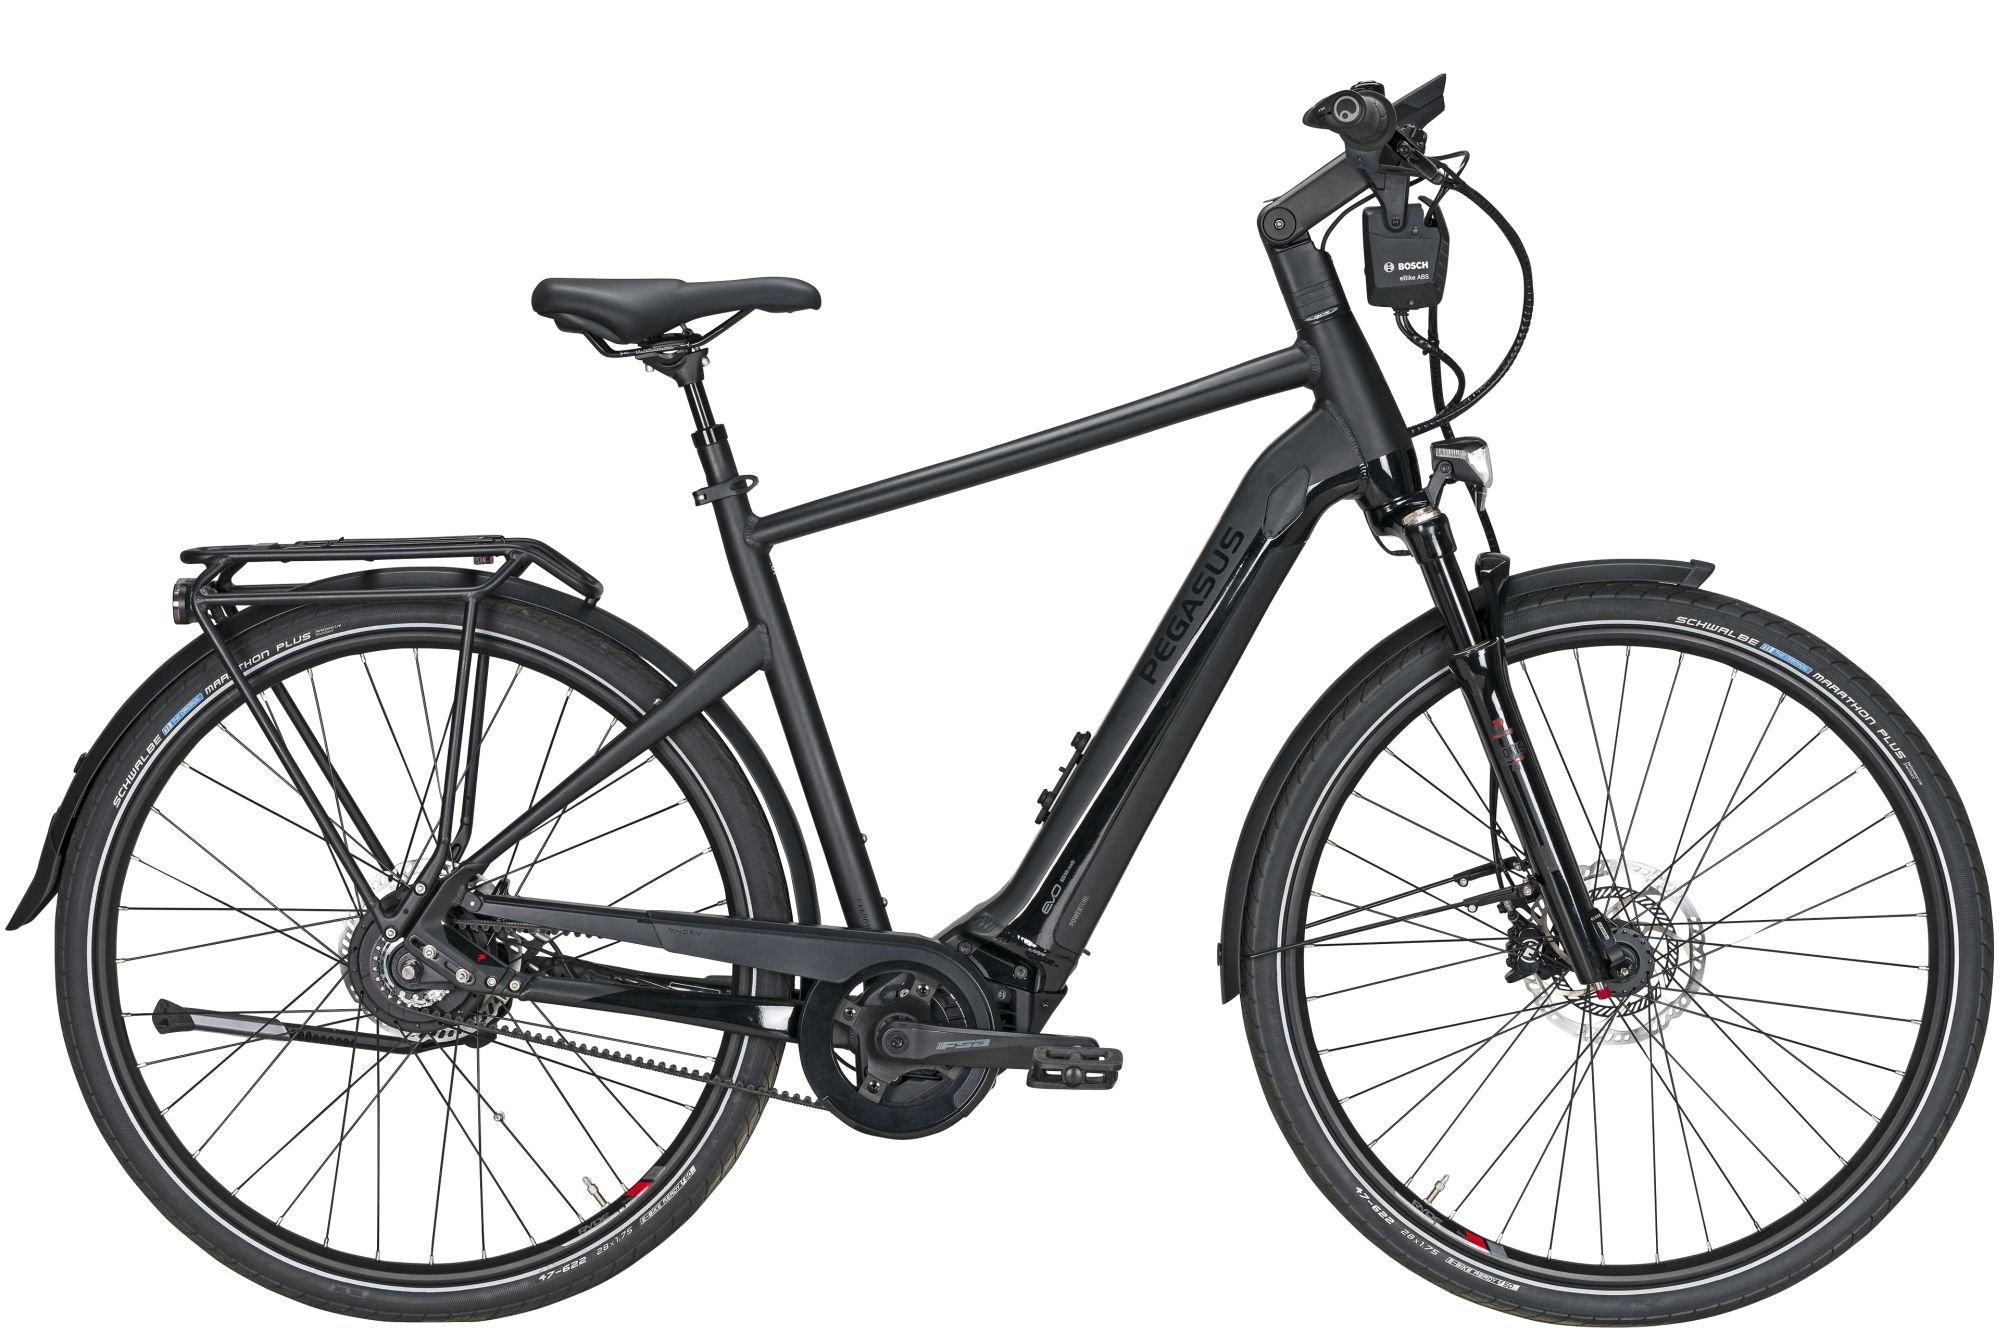 E-Bikes/Citybikes: Diamant  Premio Evo NV Lite Belt ABS (625Wh) stufenlose Nabenschaltung Herrenfahrrad Diamant Modell 2021 28 Zoll 45 cm